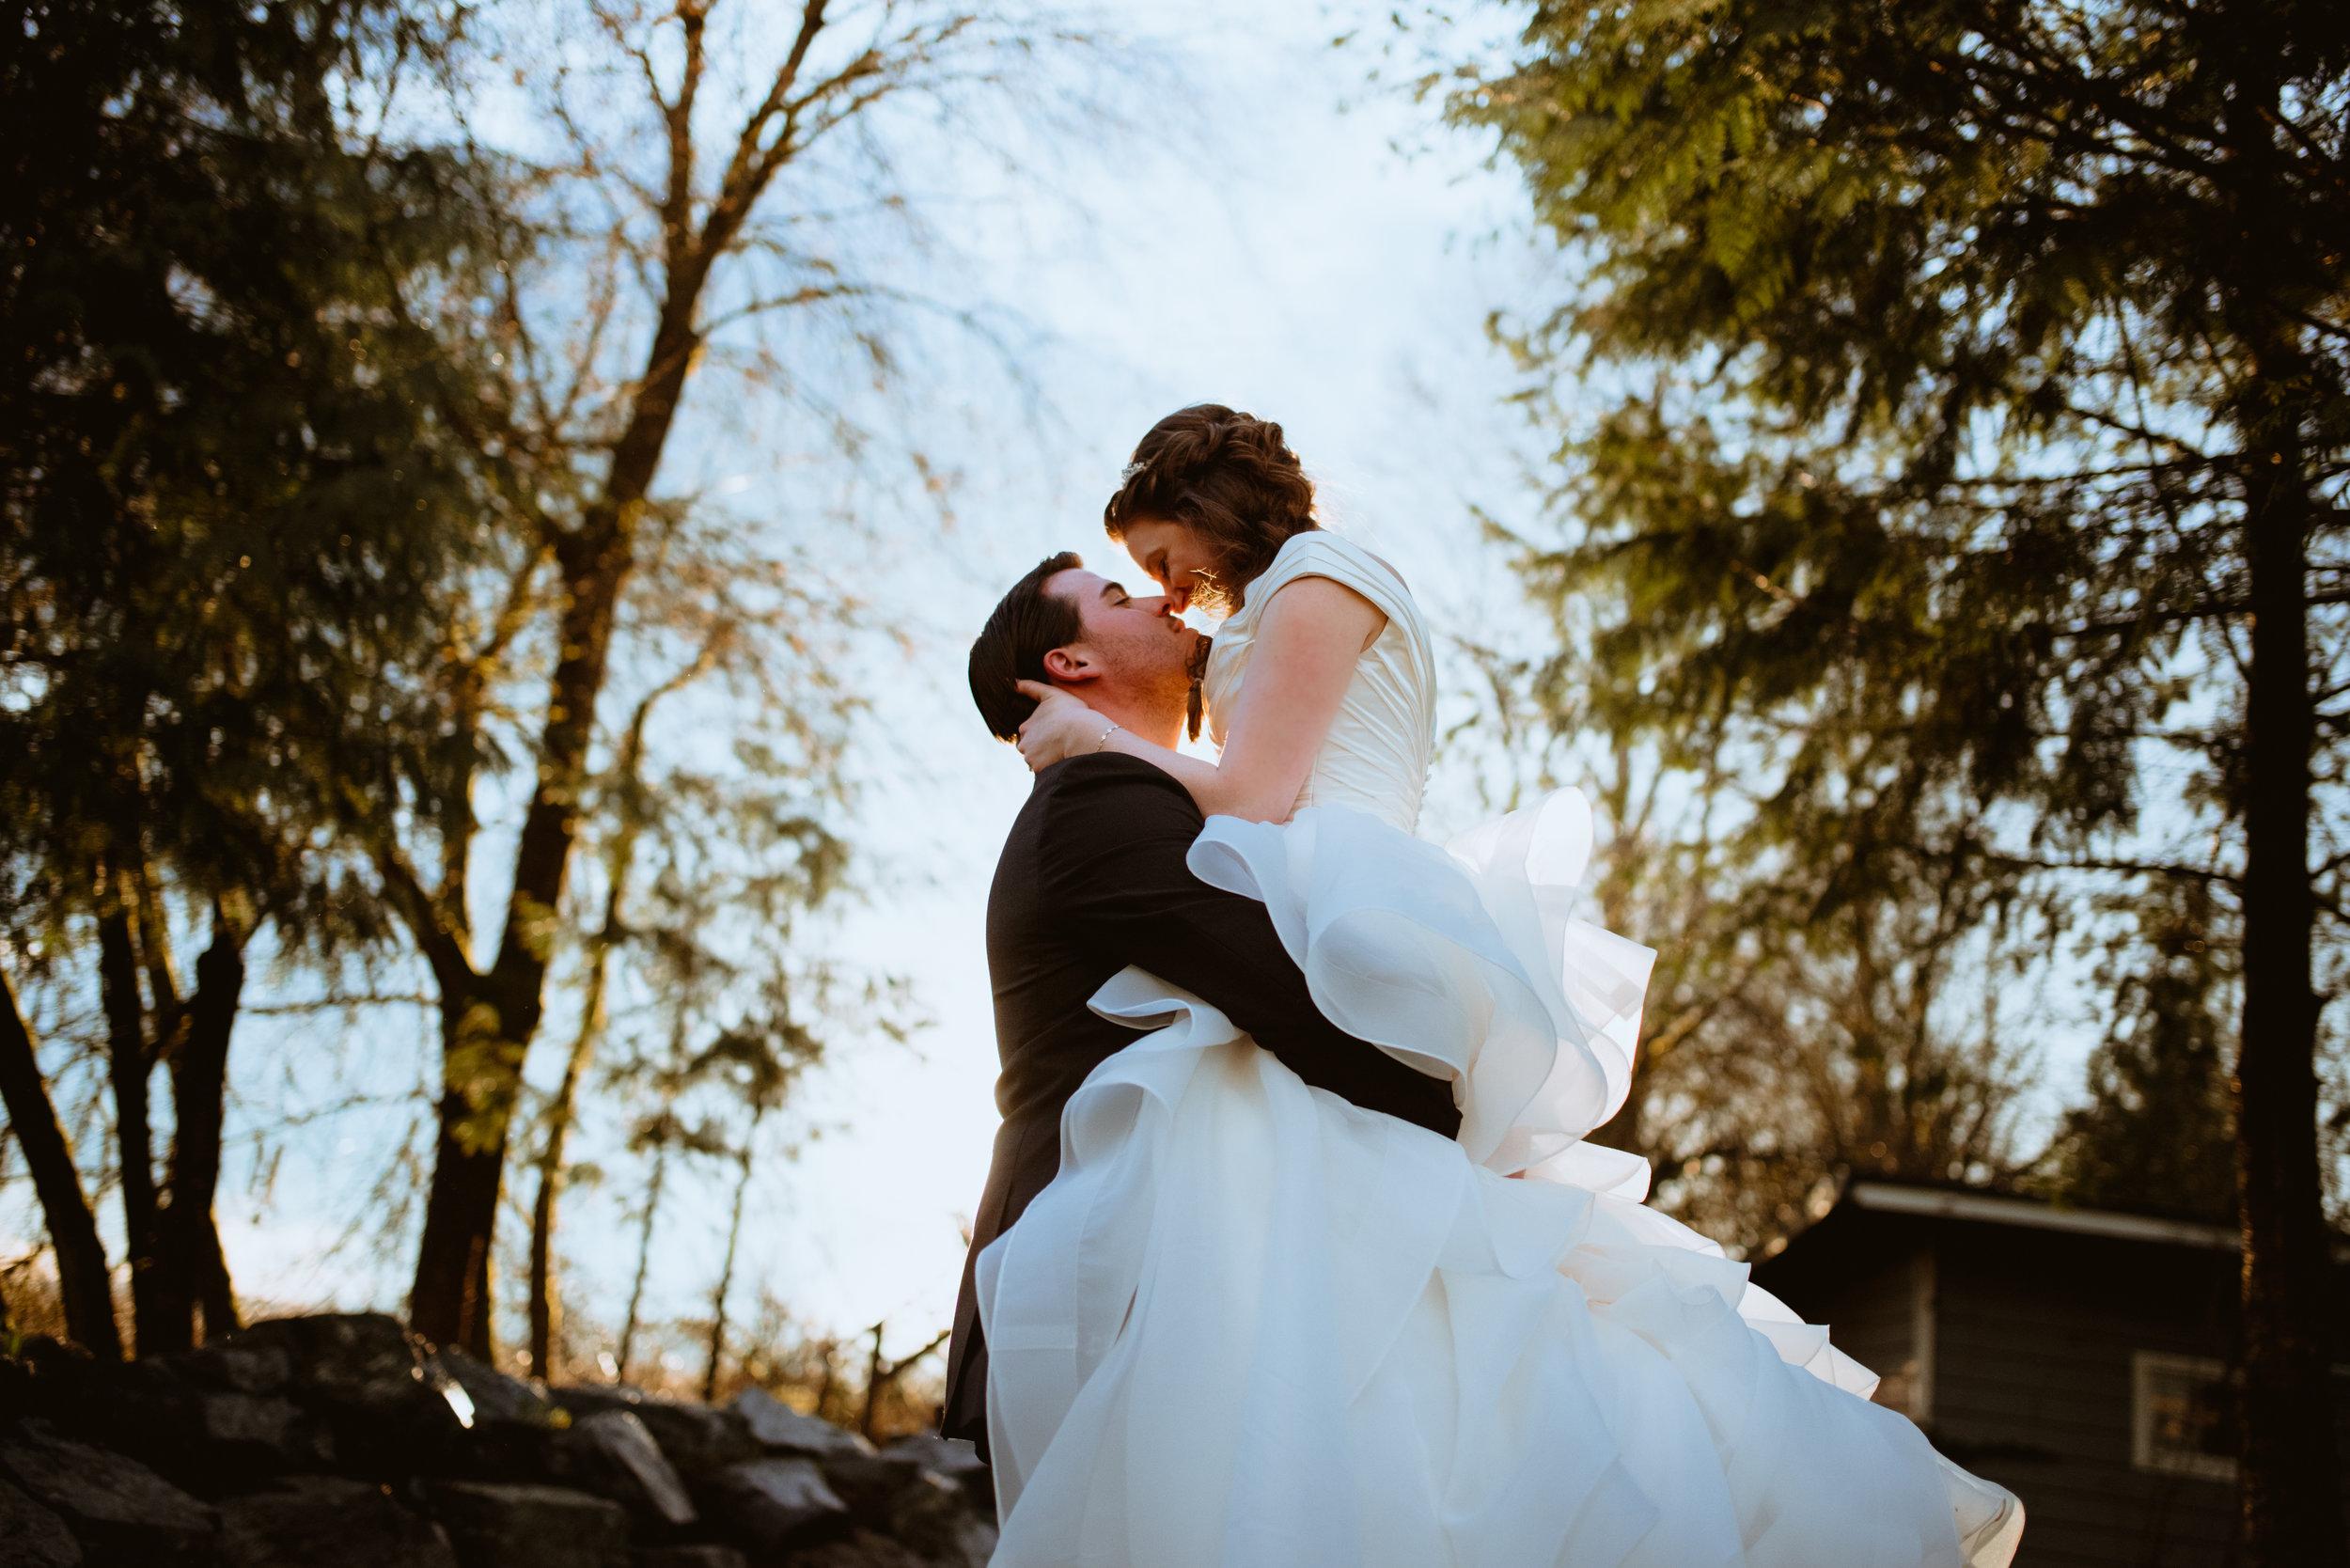 Jaffa & Jim's Wedding (418 of 513).JPG